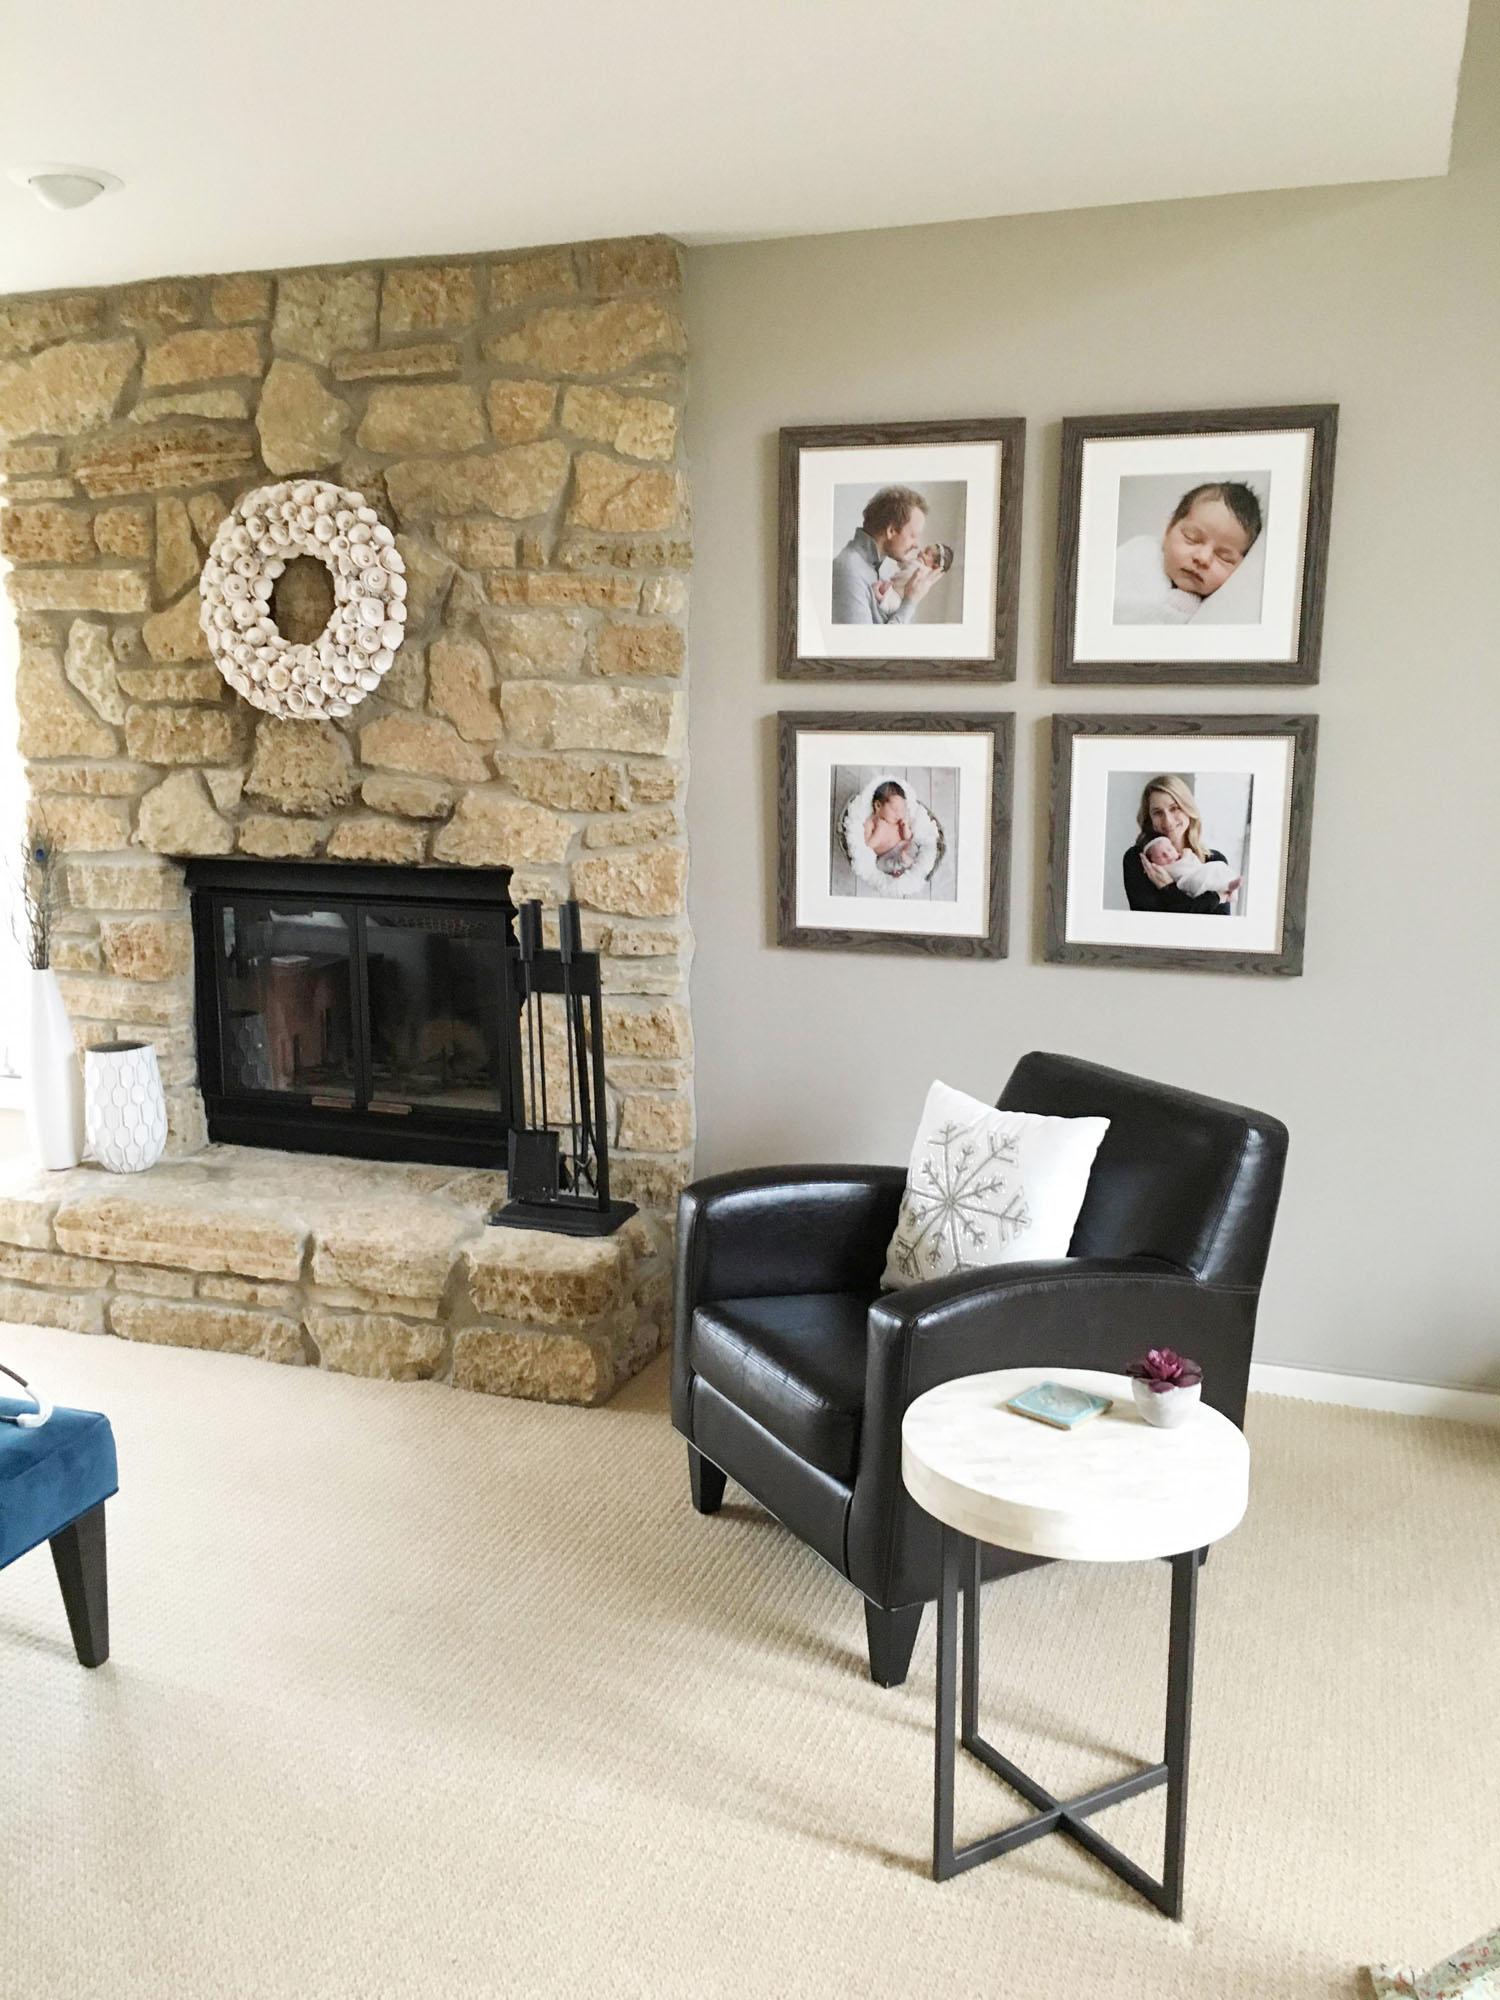 Custom artwork for the fireplace